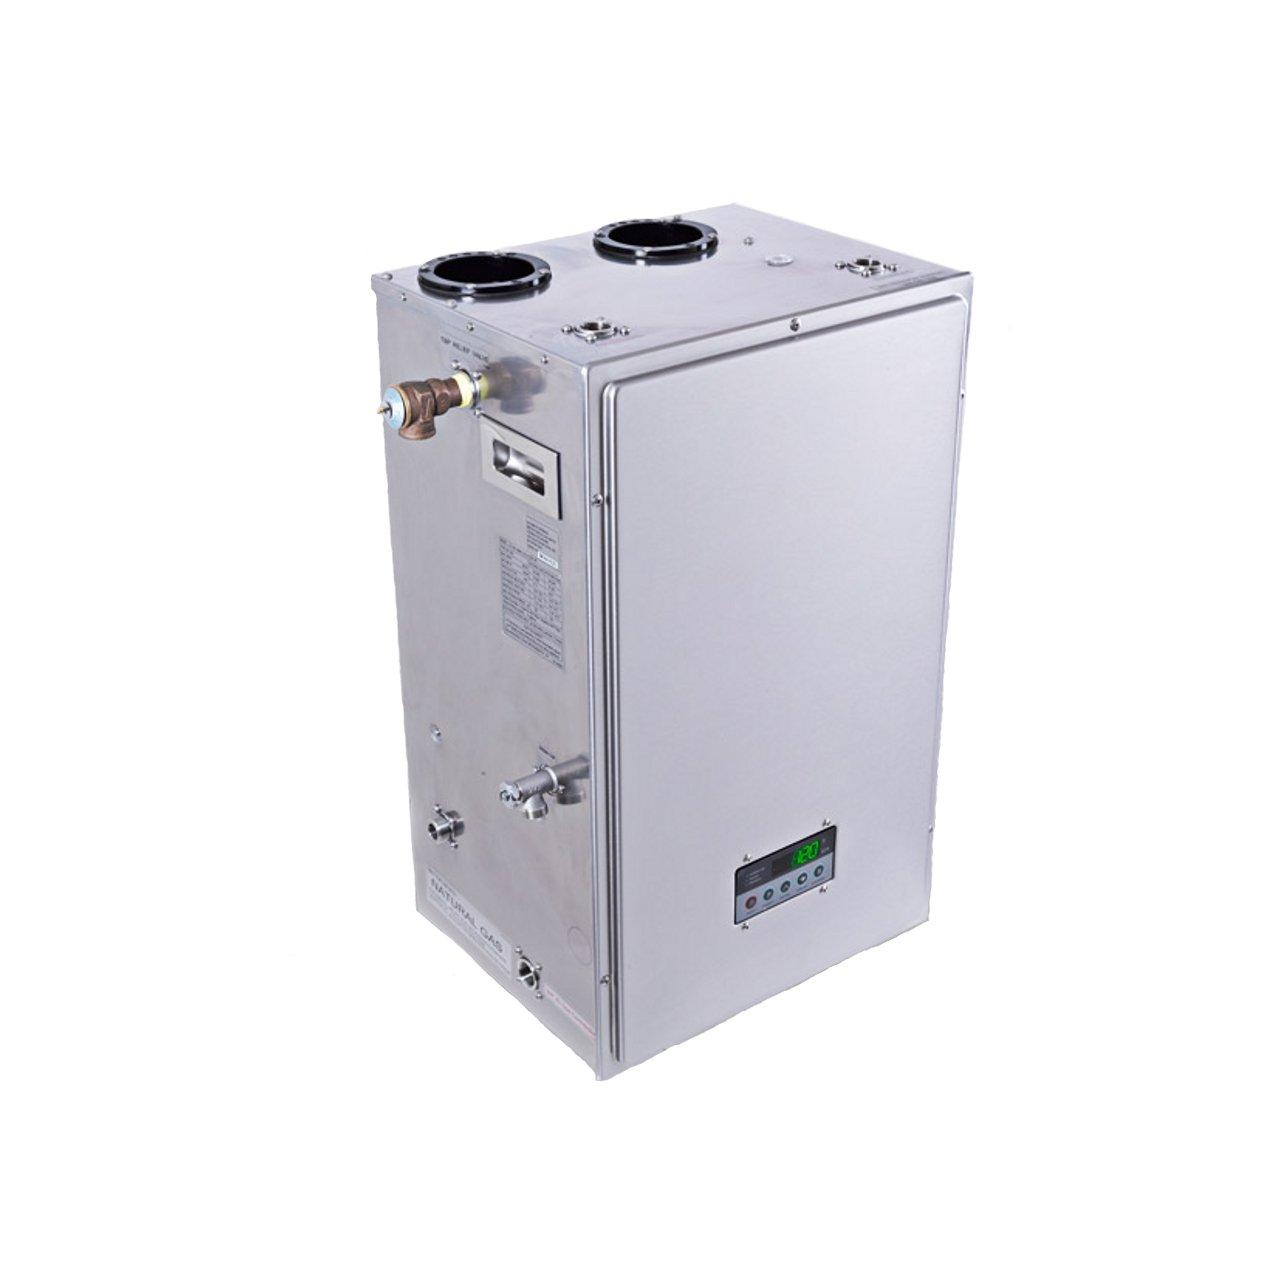 Condensation Water Heater Condensing Hybrid Water